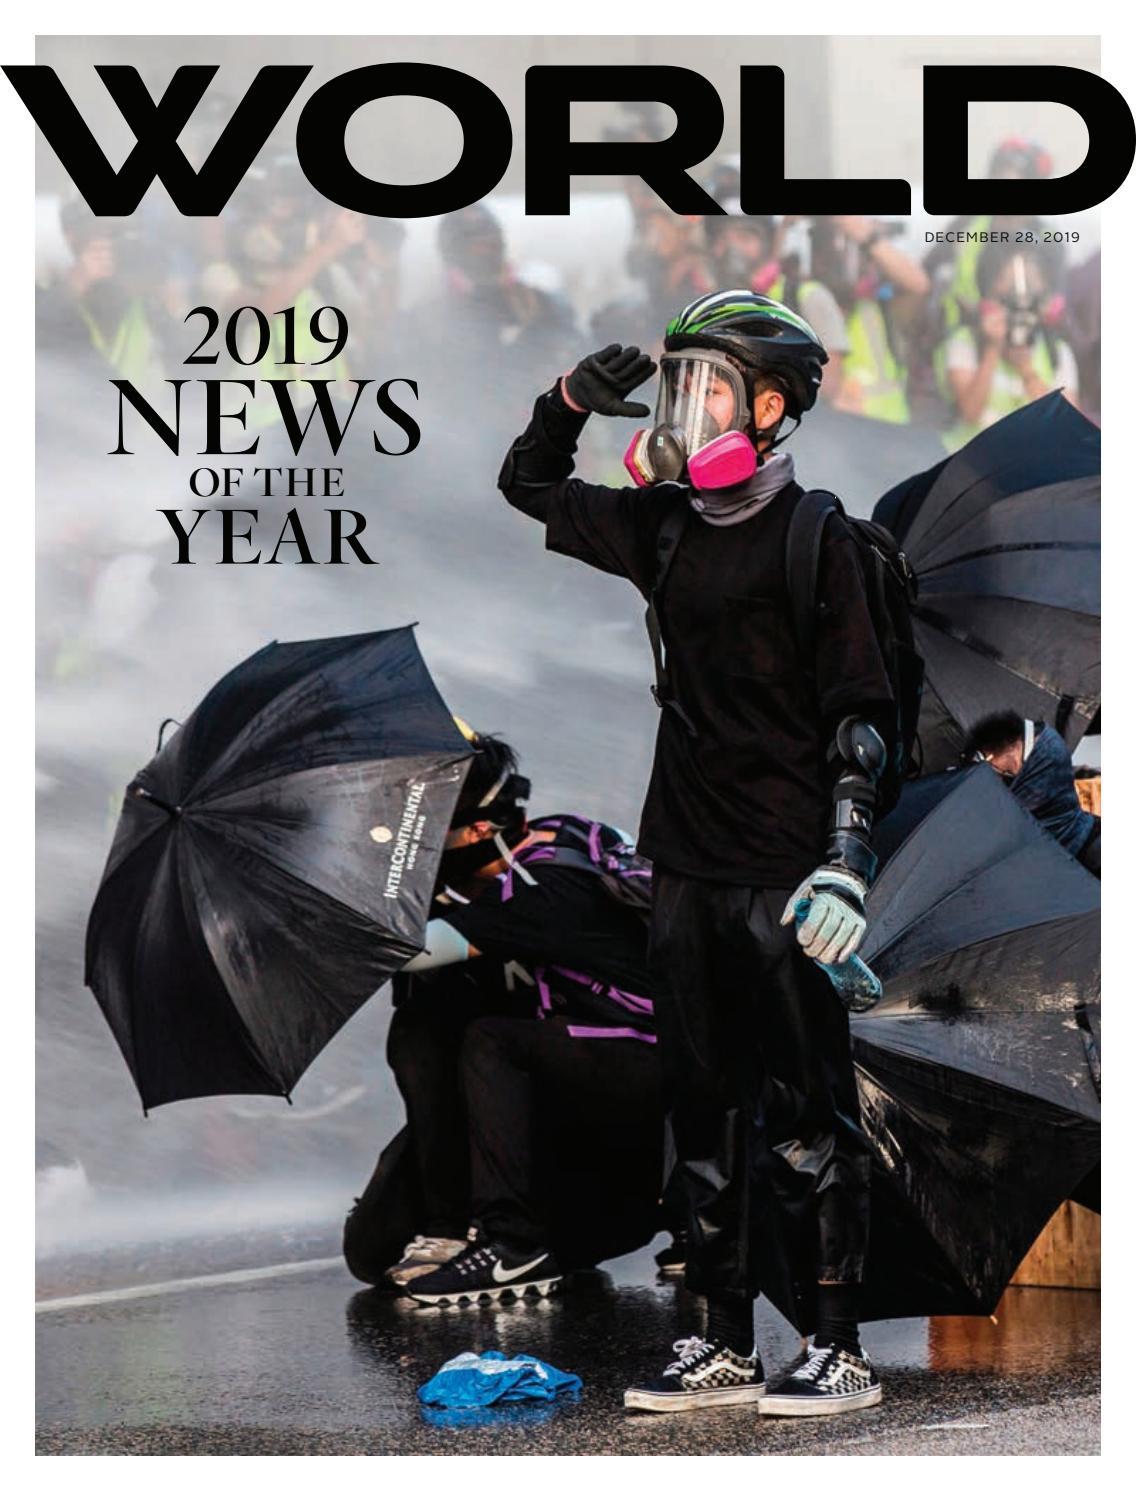 World Magazine December 28 2019 Vol 34 No 24 By God S World